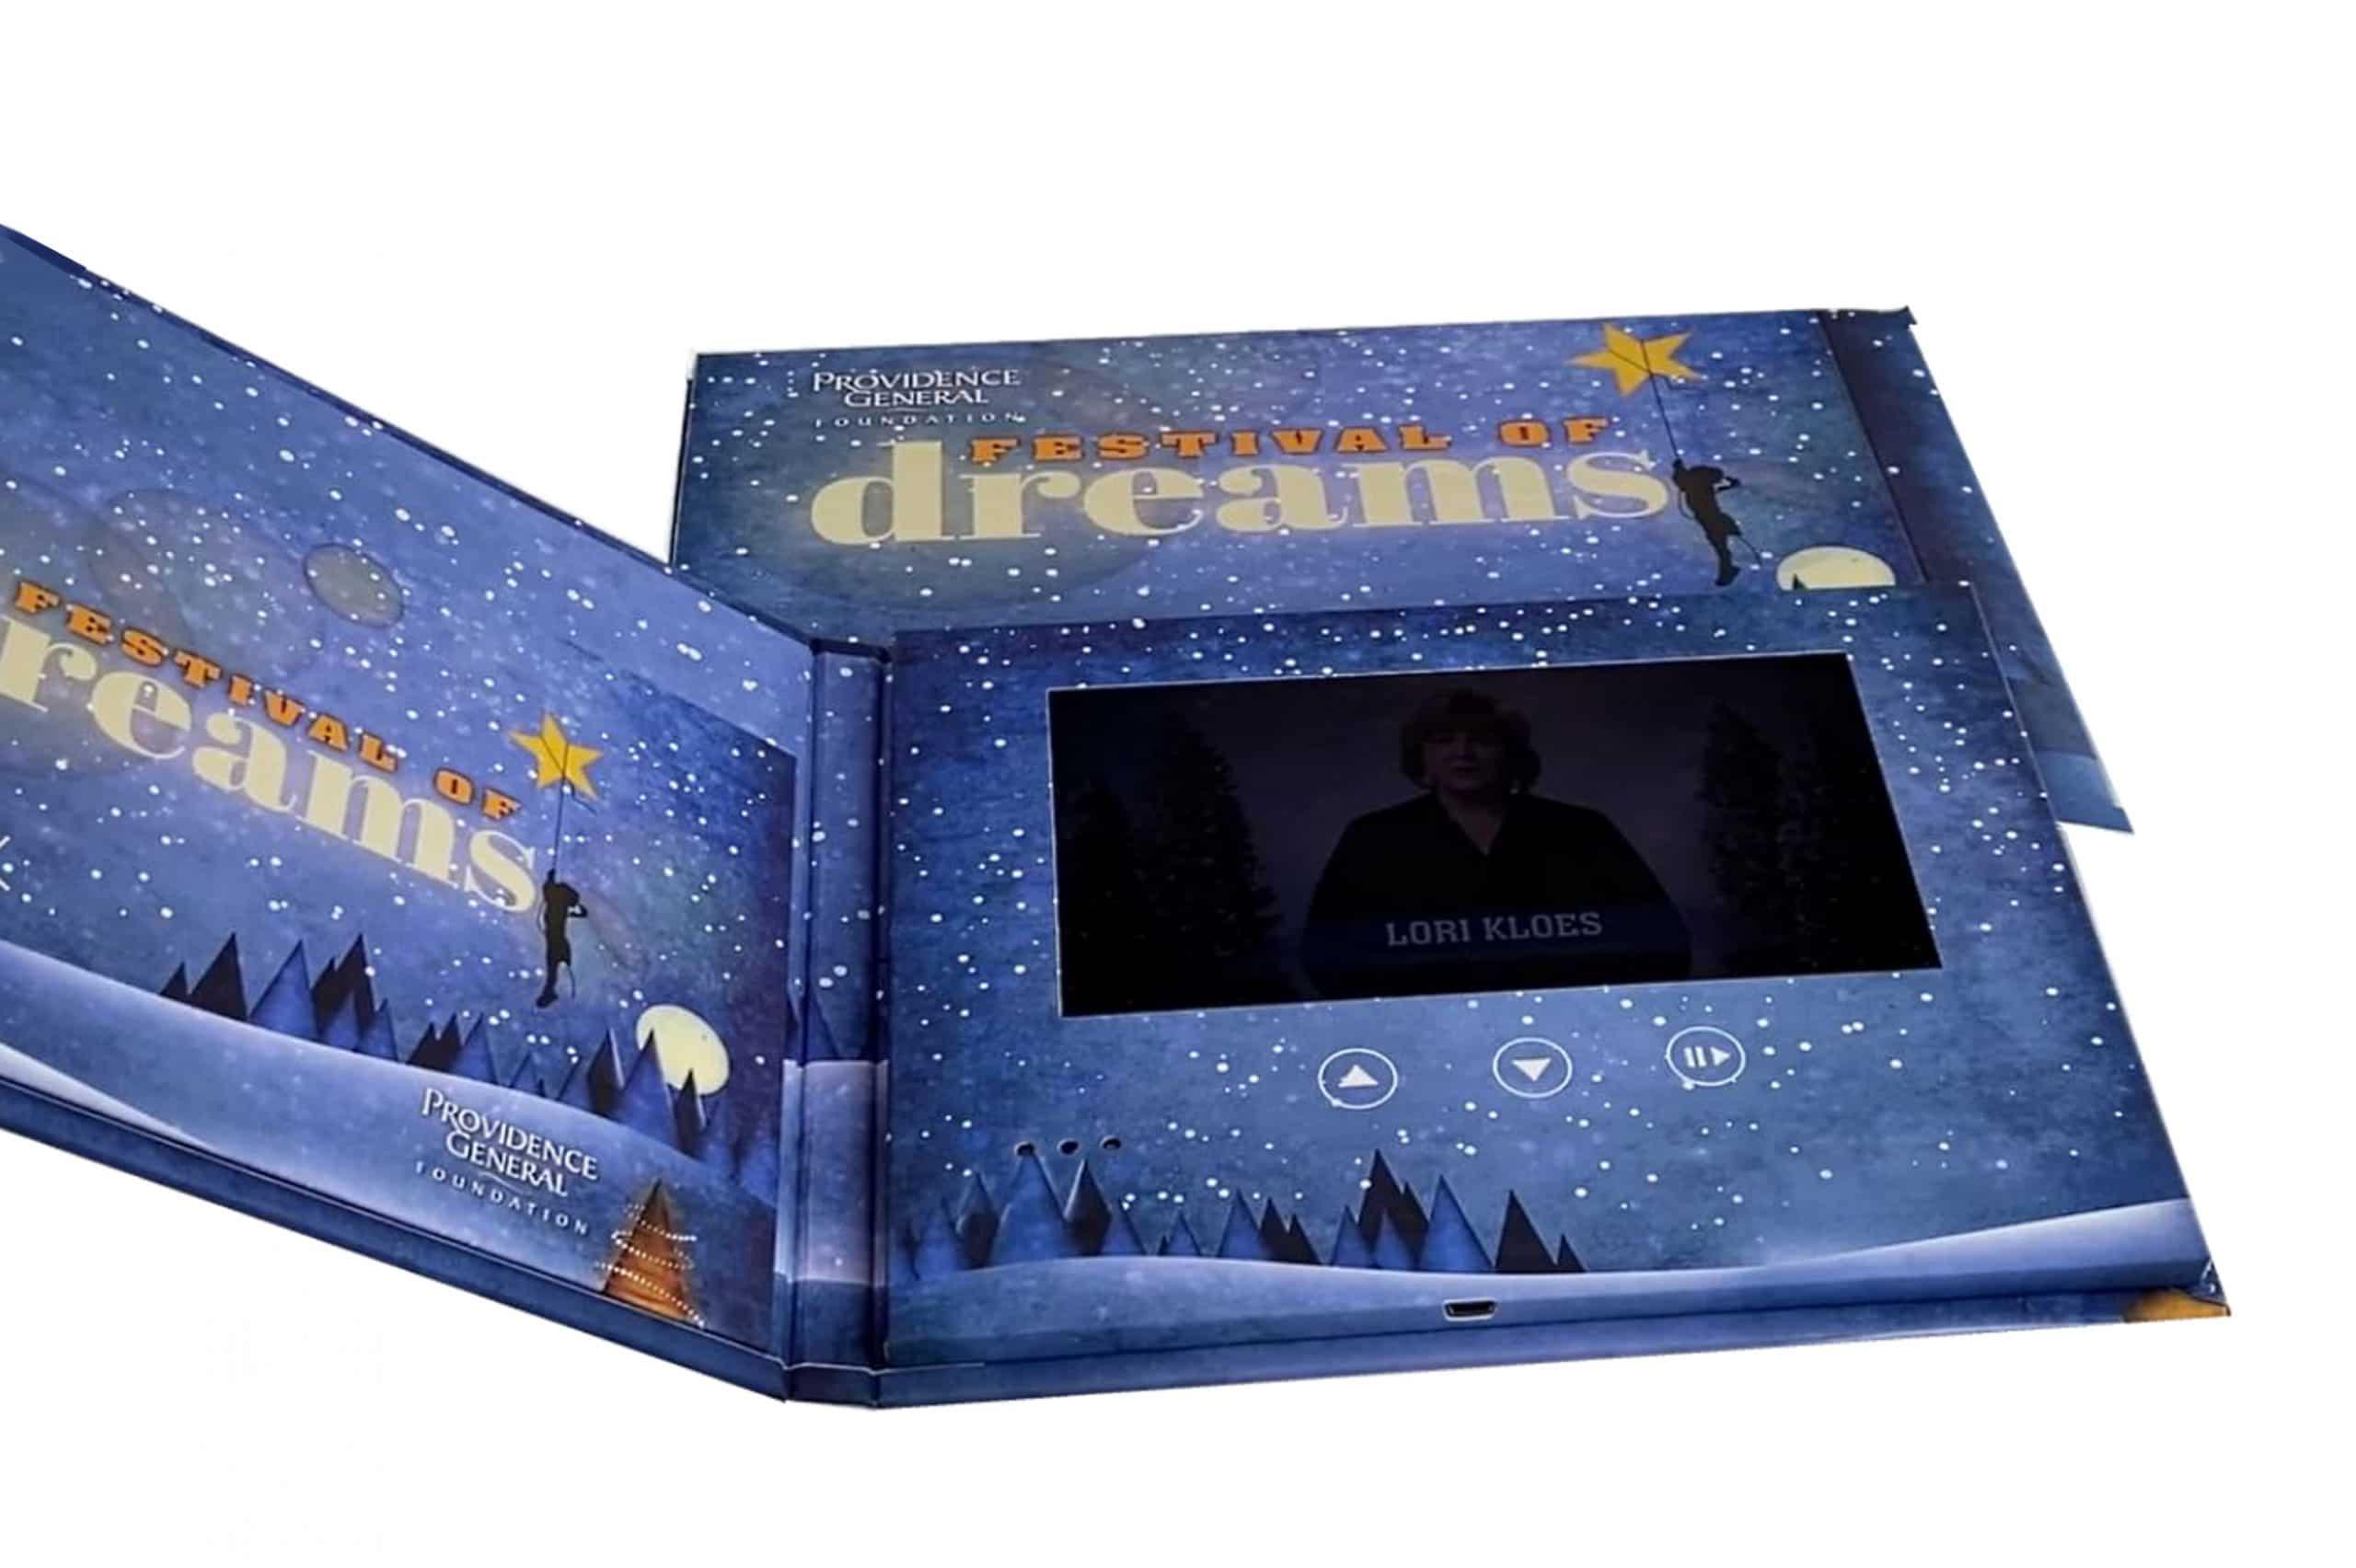 Festival of Dreams Video Brochure